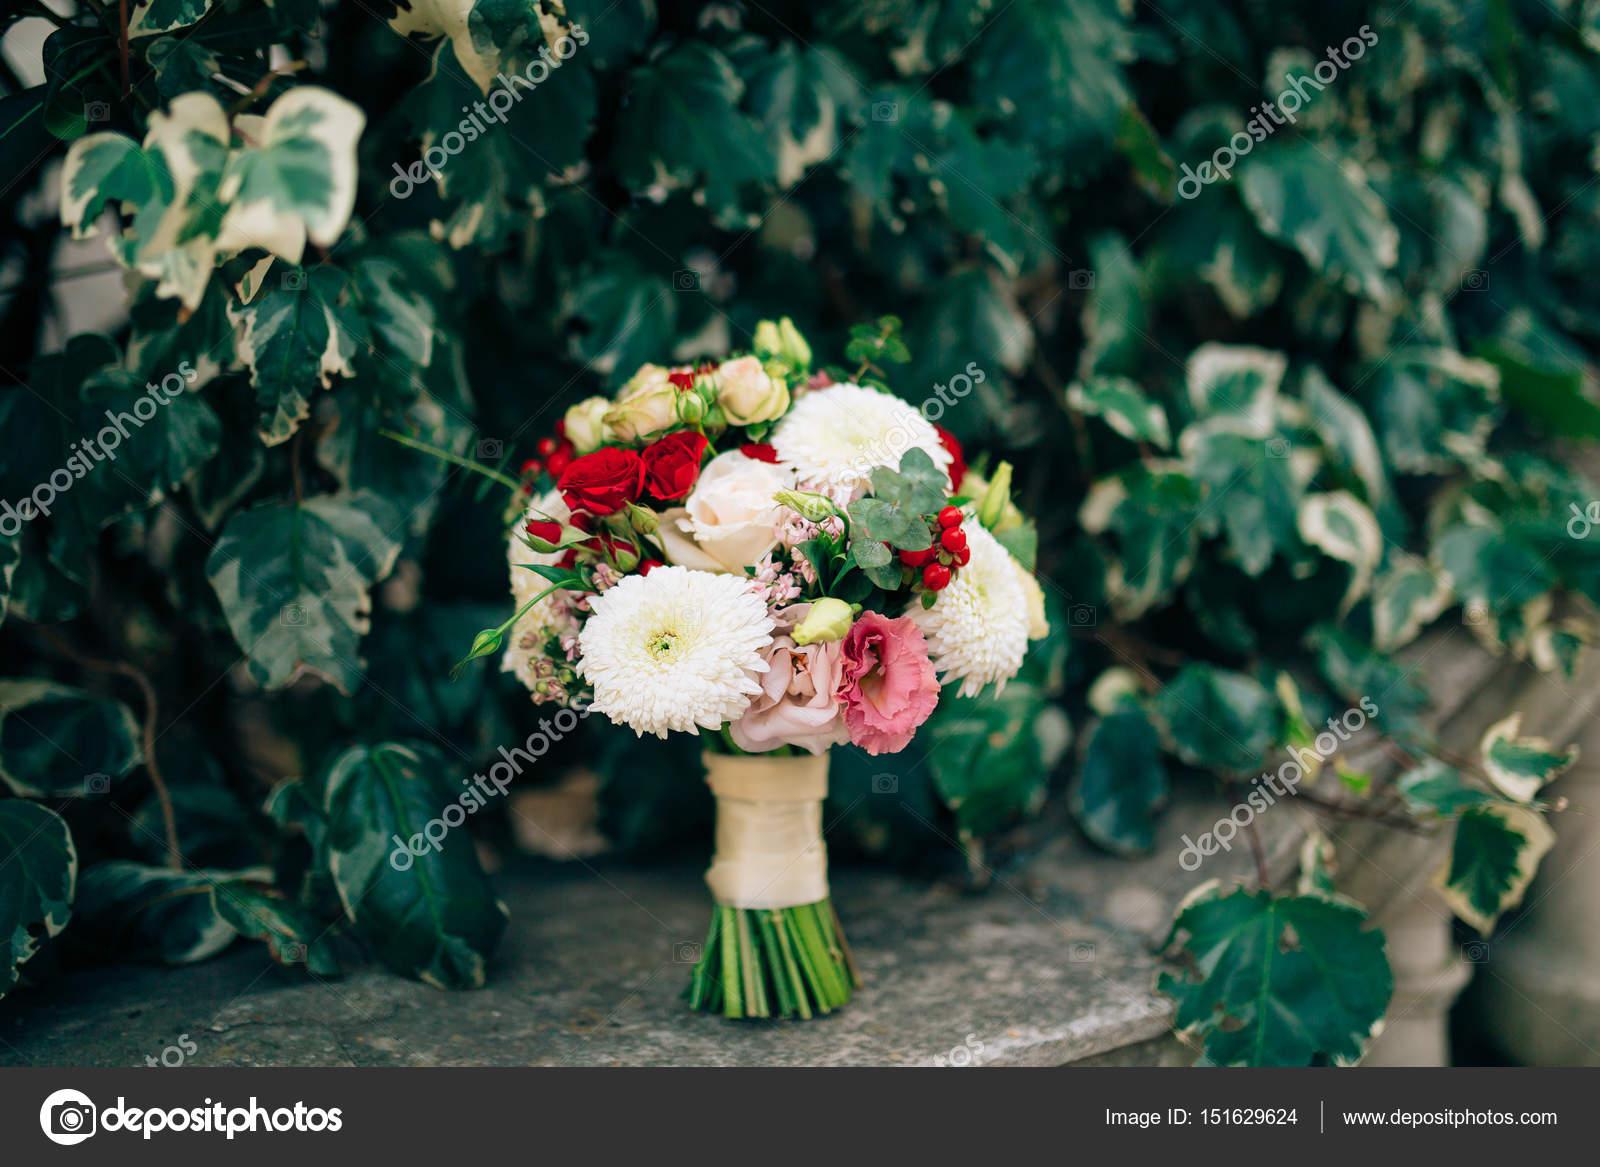 Wedding Bridal Bouquet Of Roses Chrysanthemums Eucalyptus Baby Stock Photo C Nadtochiy 151629624